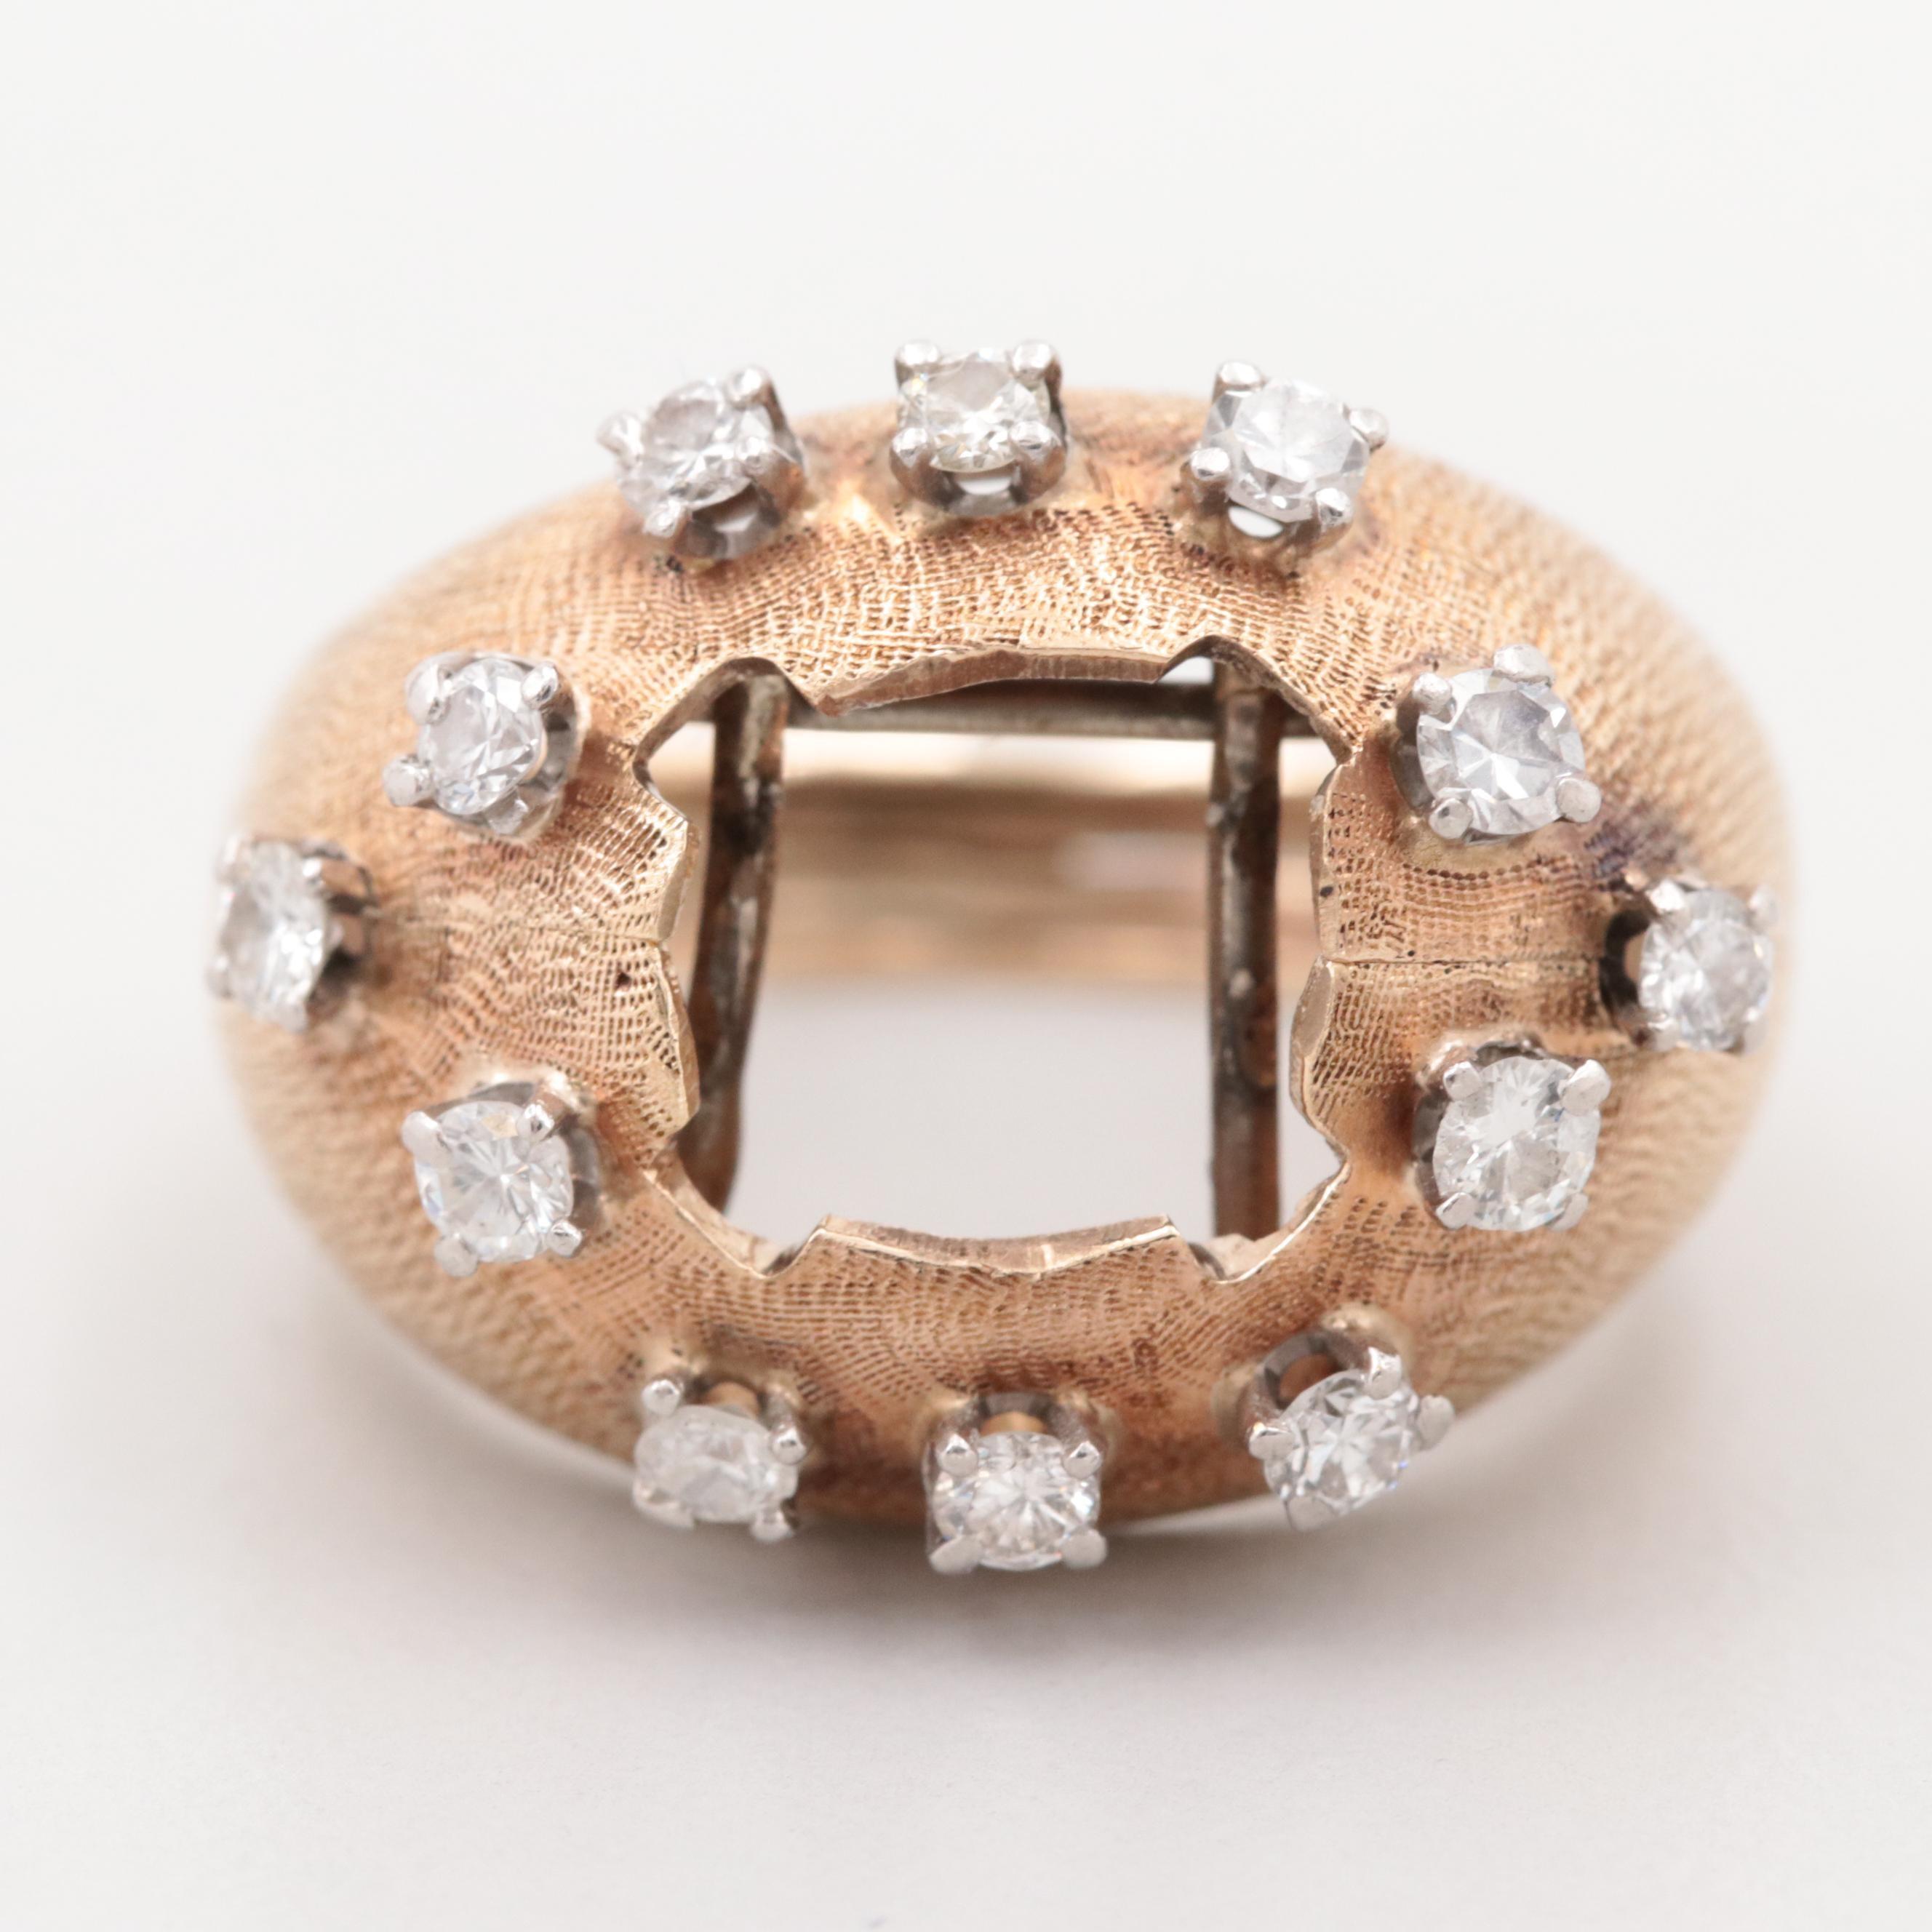 14K Yellow Gold and Palladium Diamond Ring Jacket